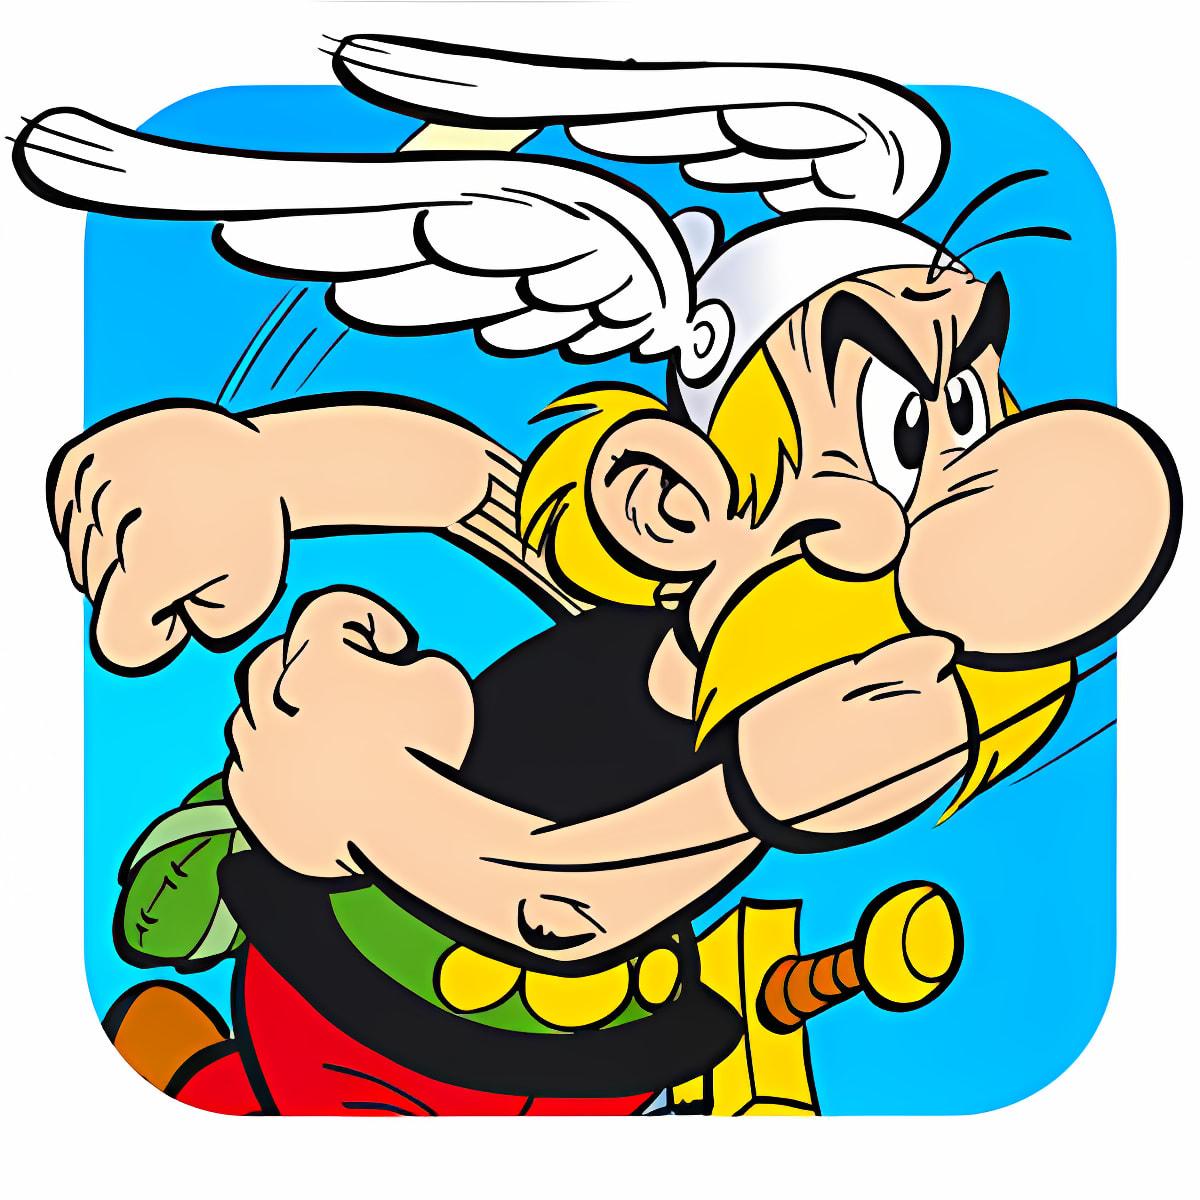 Asterix: Megatapa